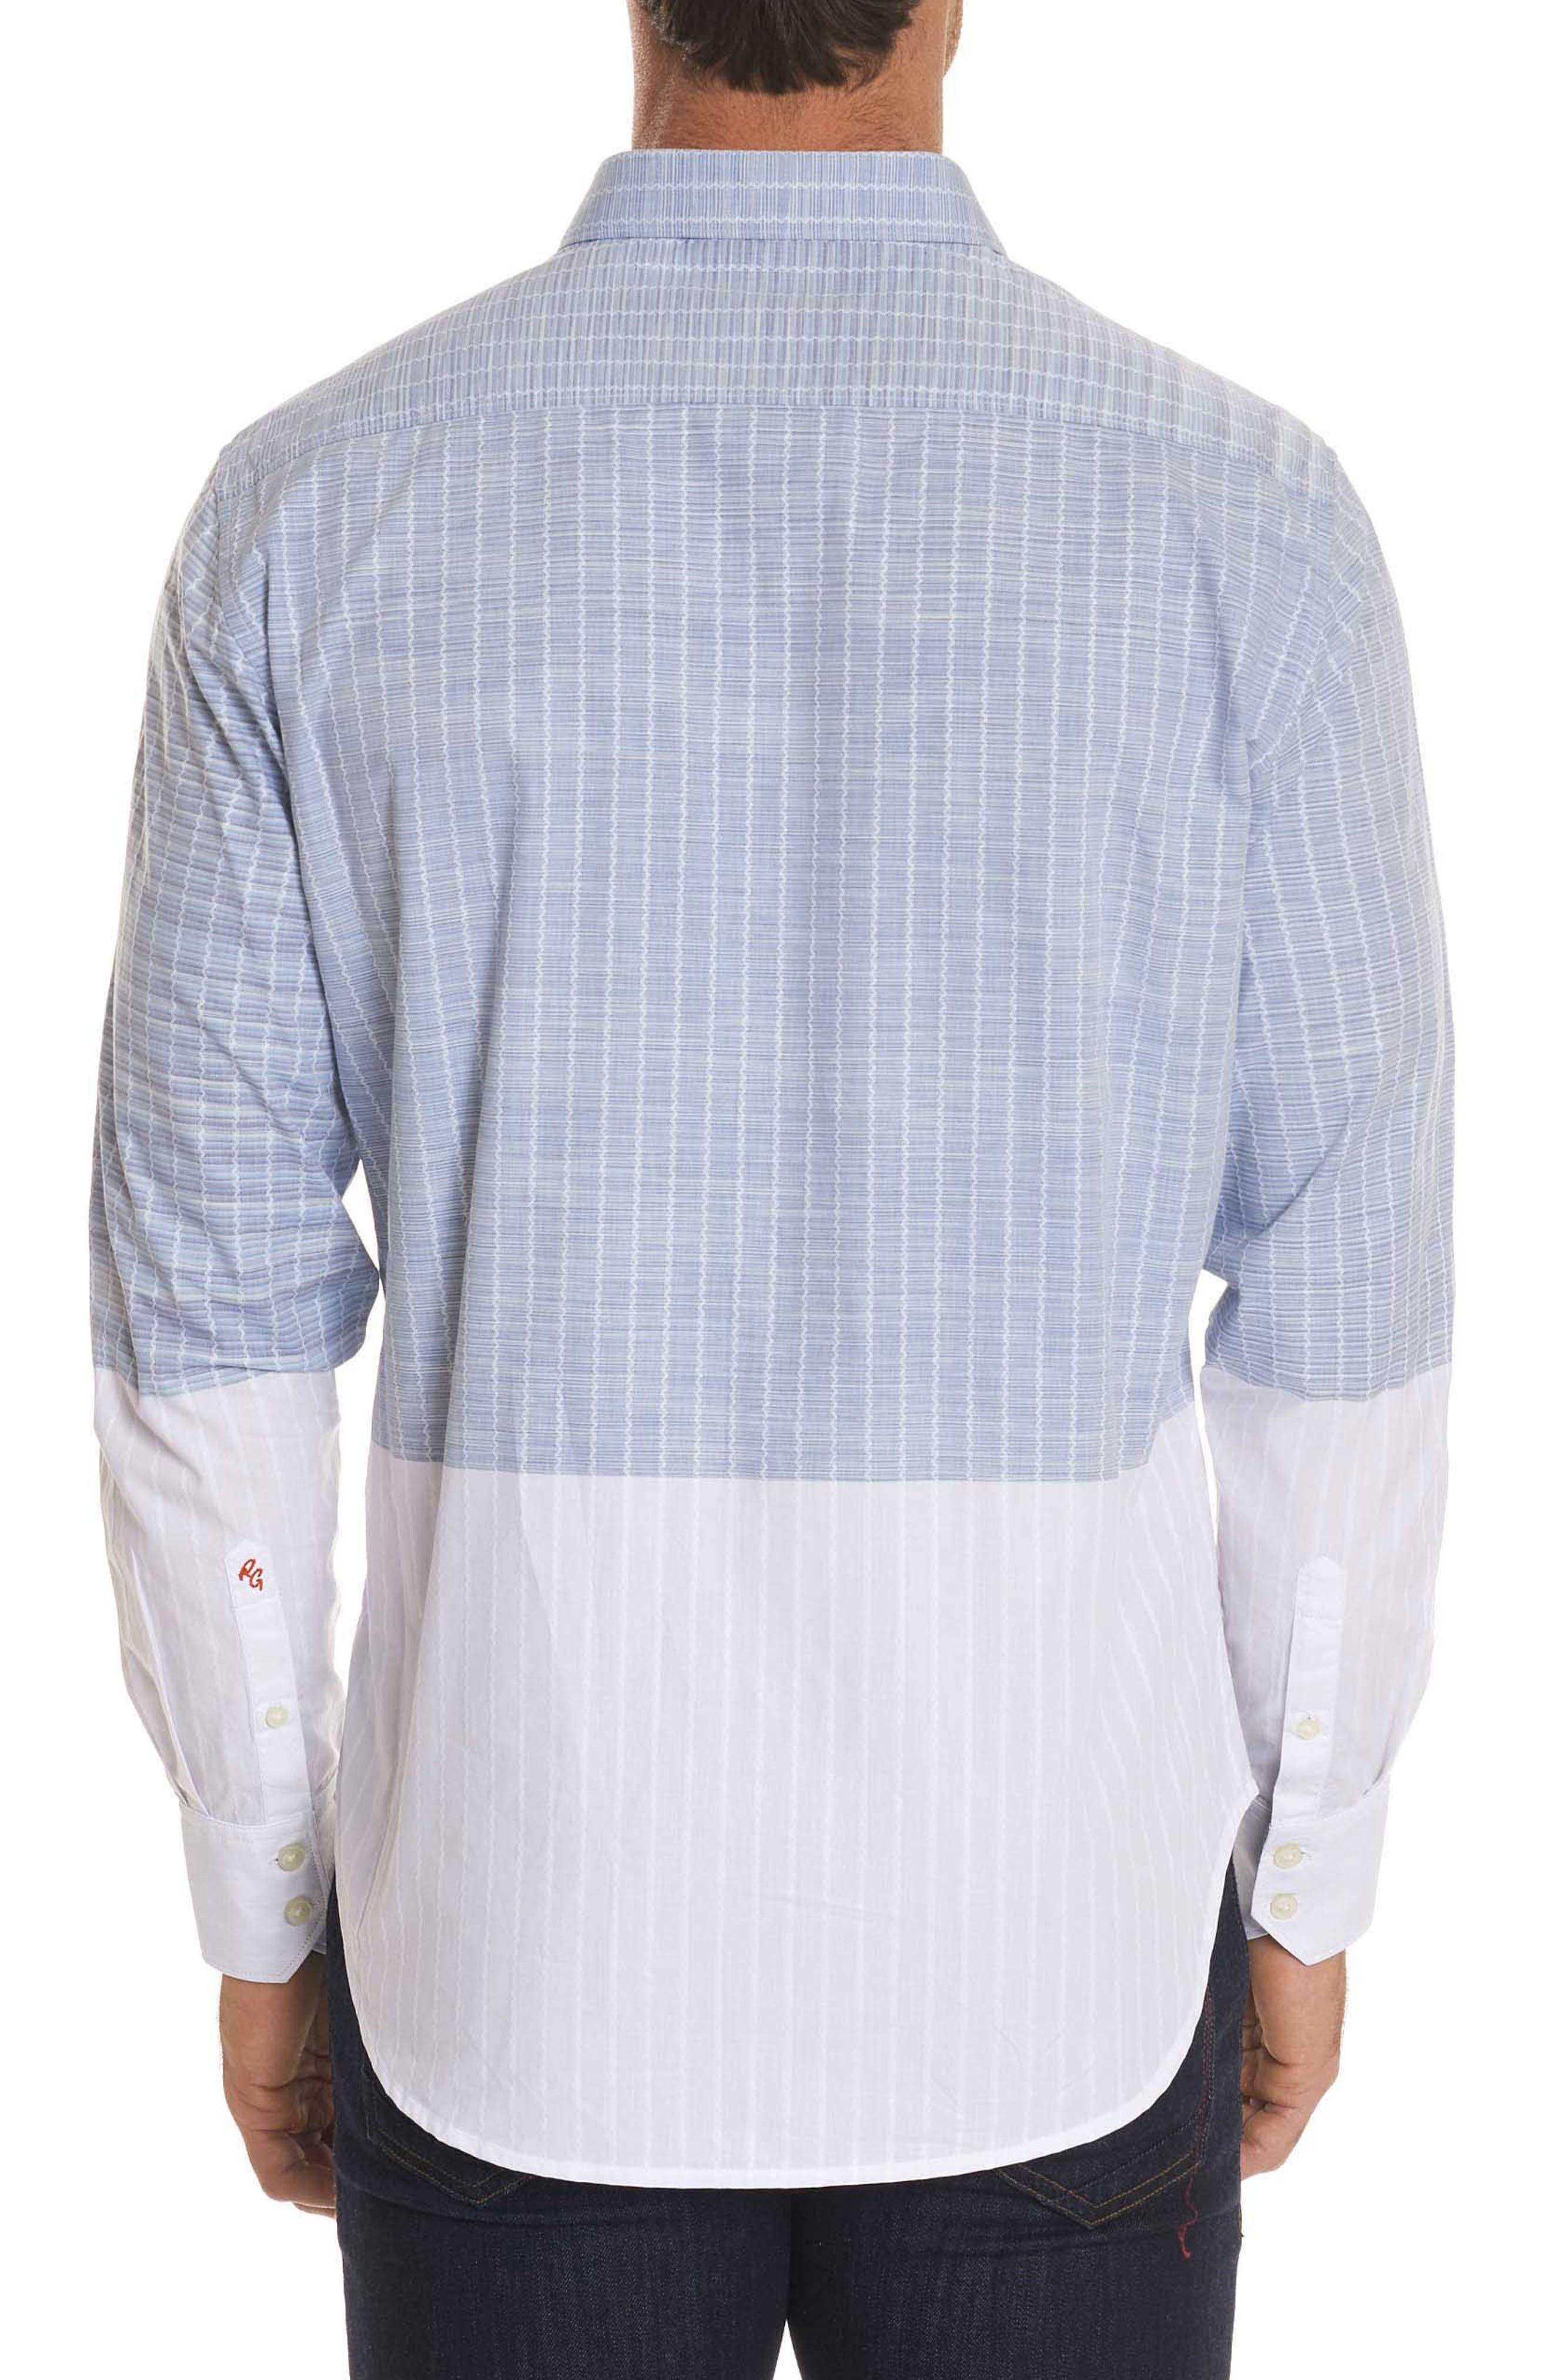 Cano Classic Fit Sport Shirt,                             Alternate thumbnail 3, color,                             Blue